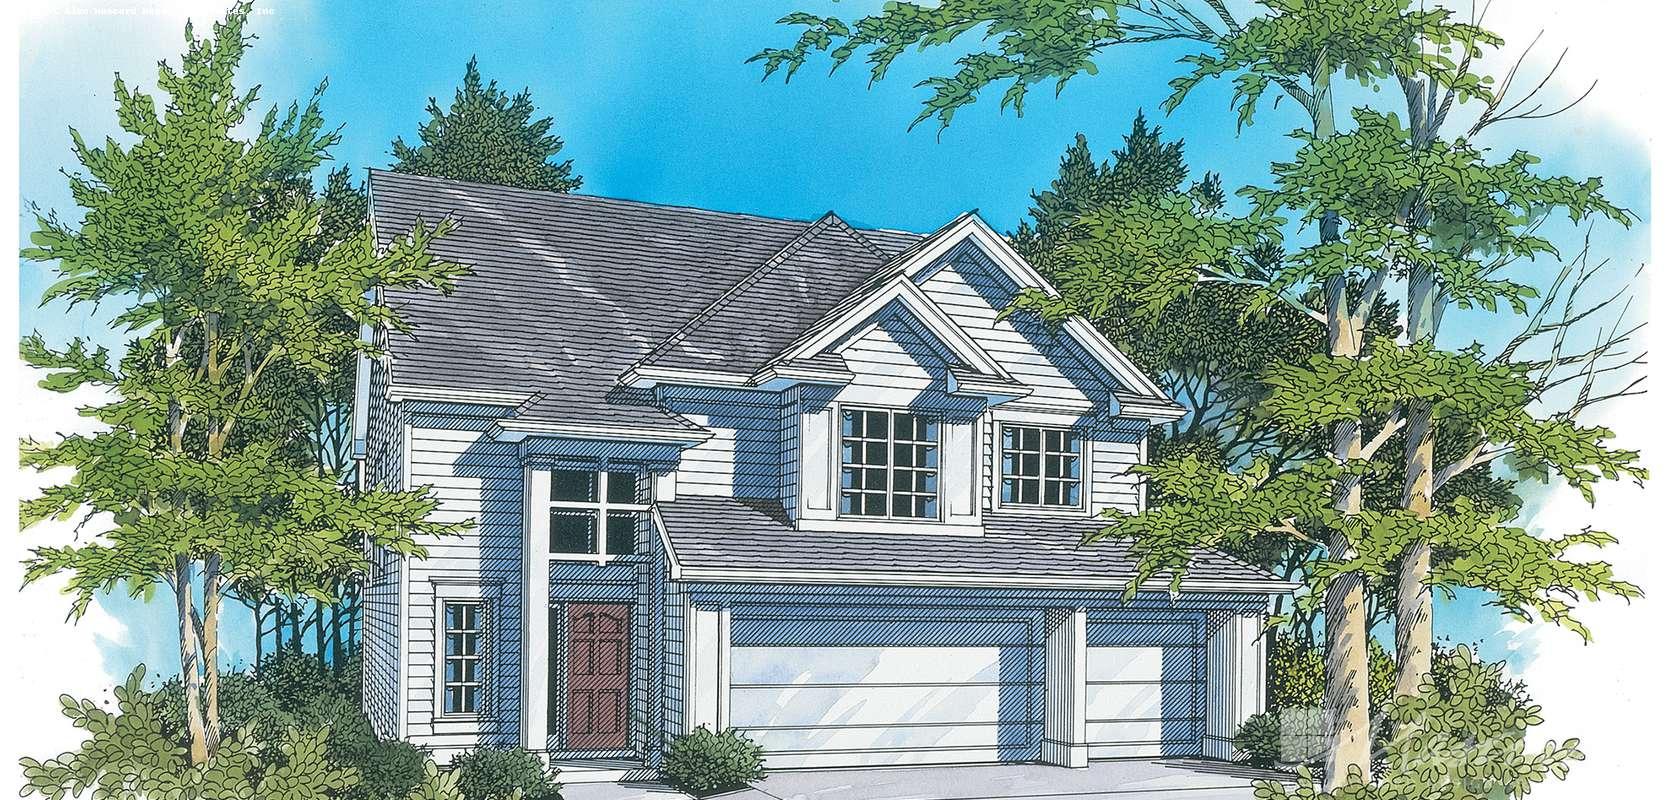 Mascord House Plan 2108: The Burgess